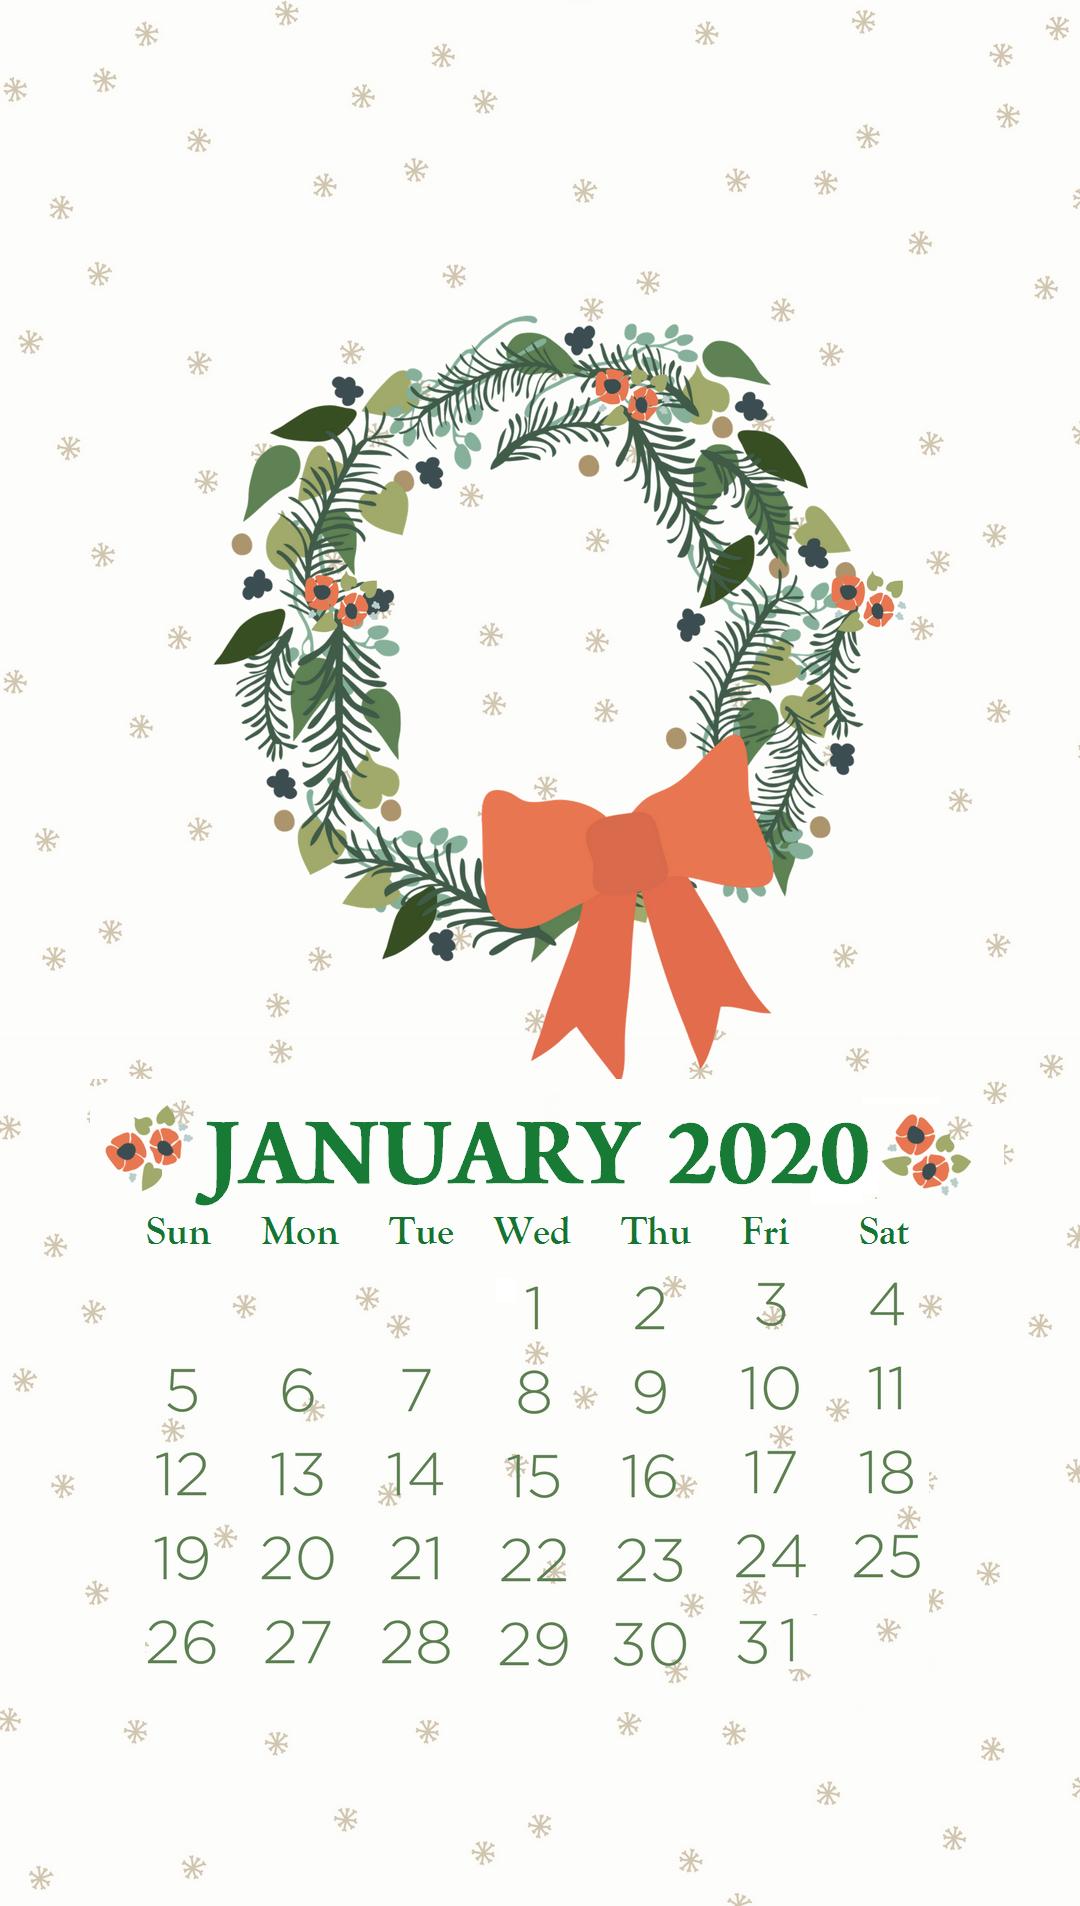 iPhone January 2020 Calendar Wallpaper Рождественские